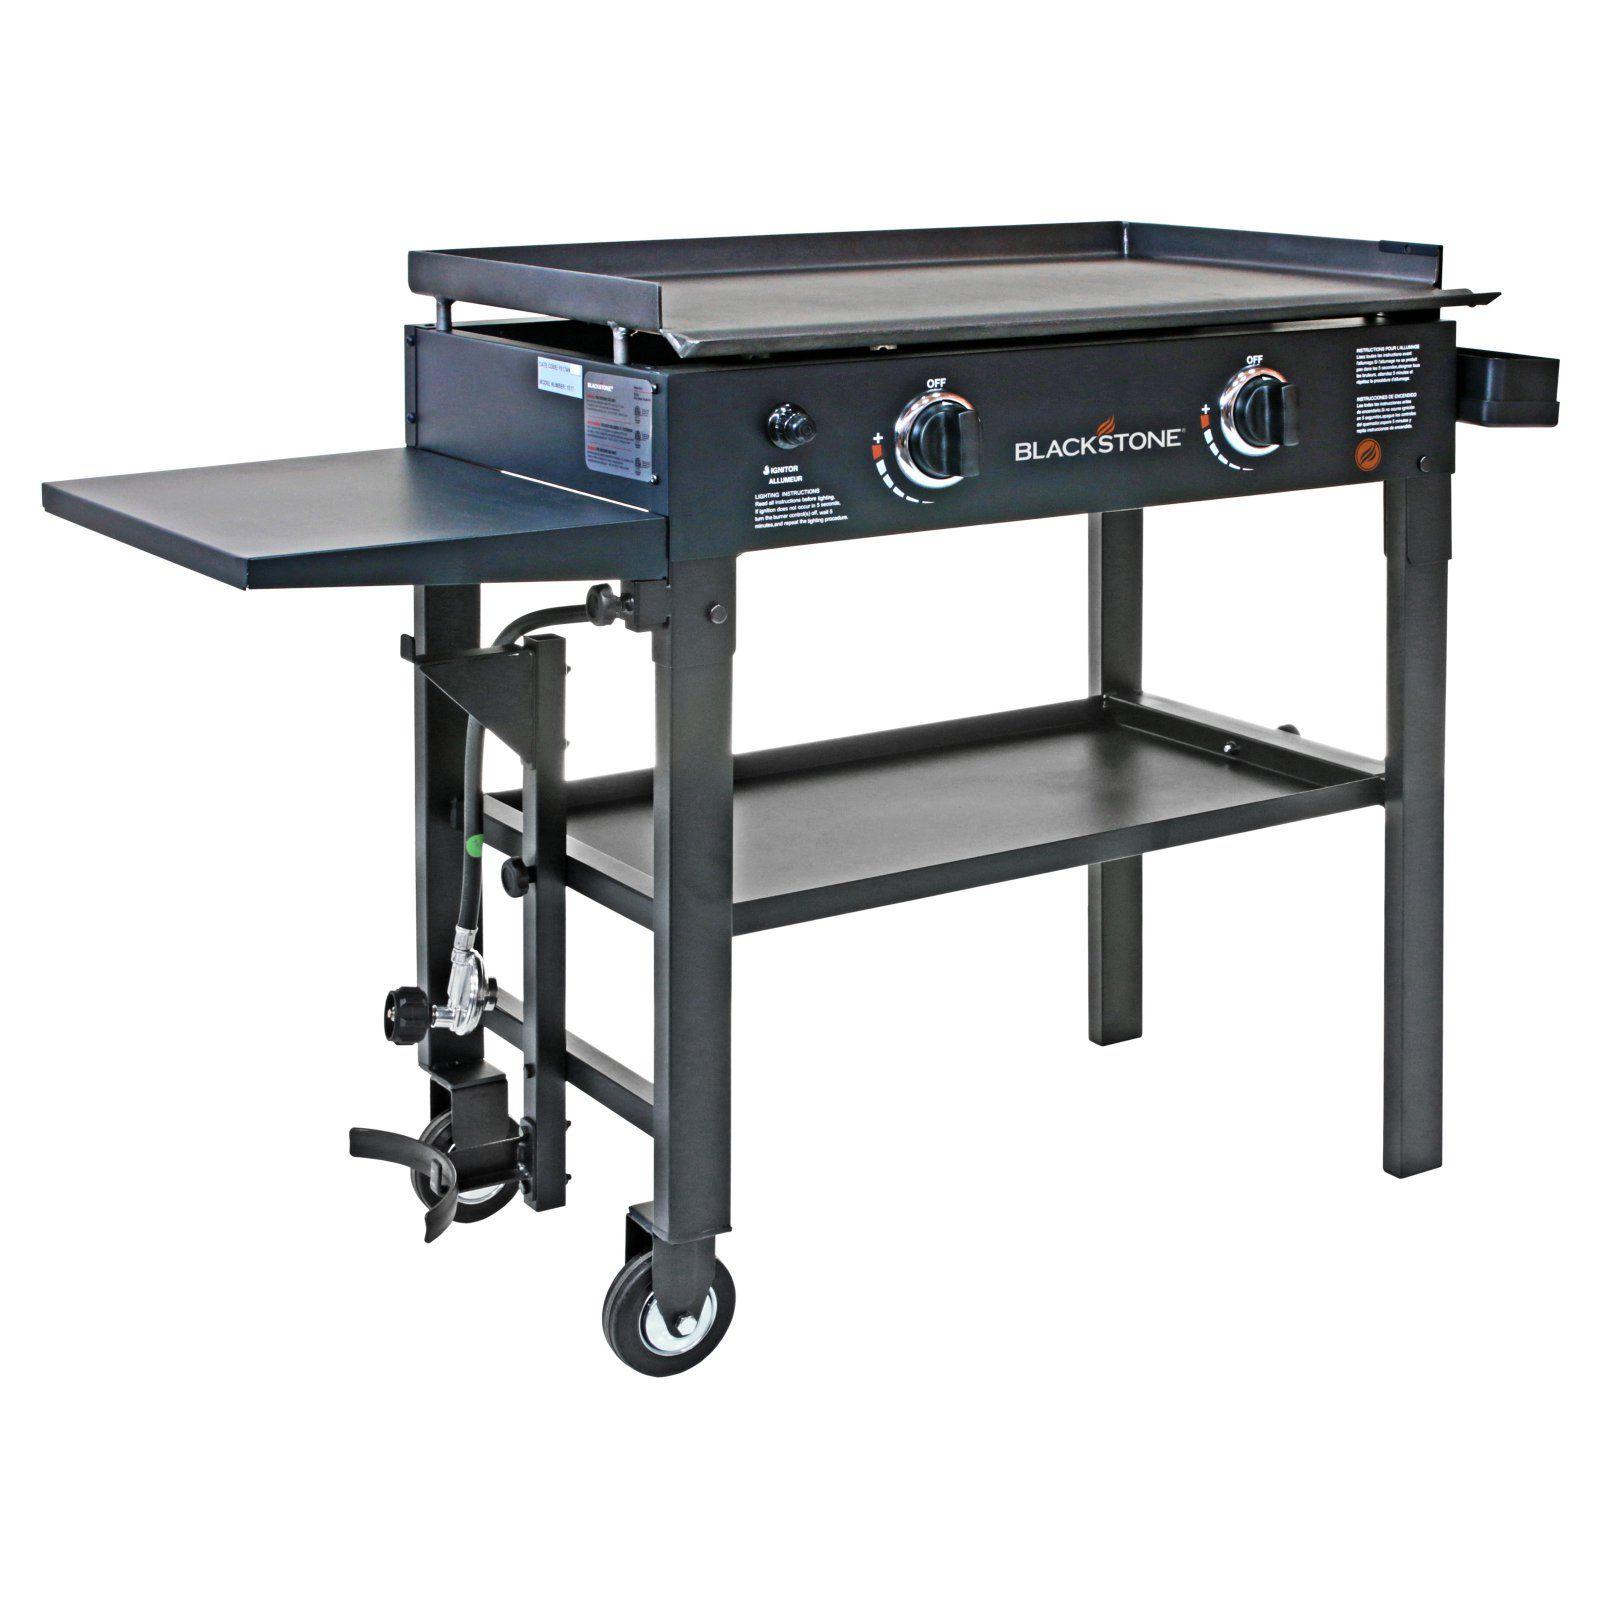 Blackstone 28 in griddle cooking station griddle